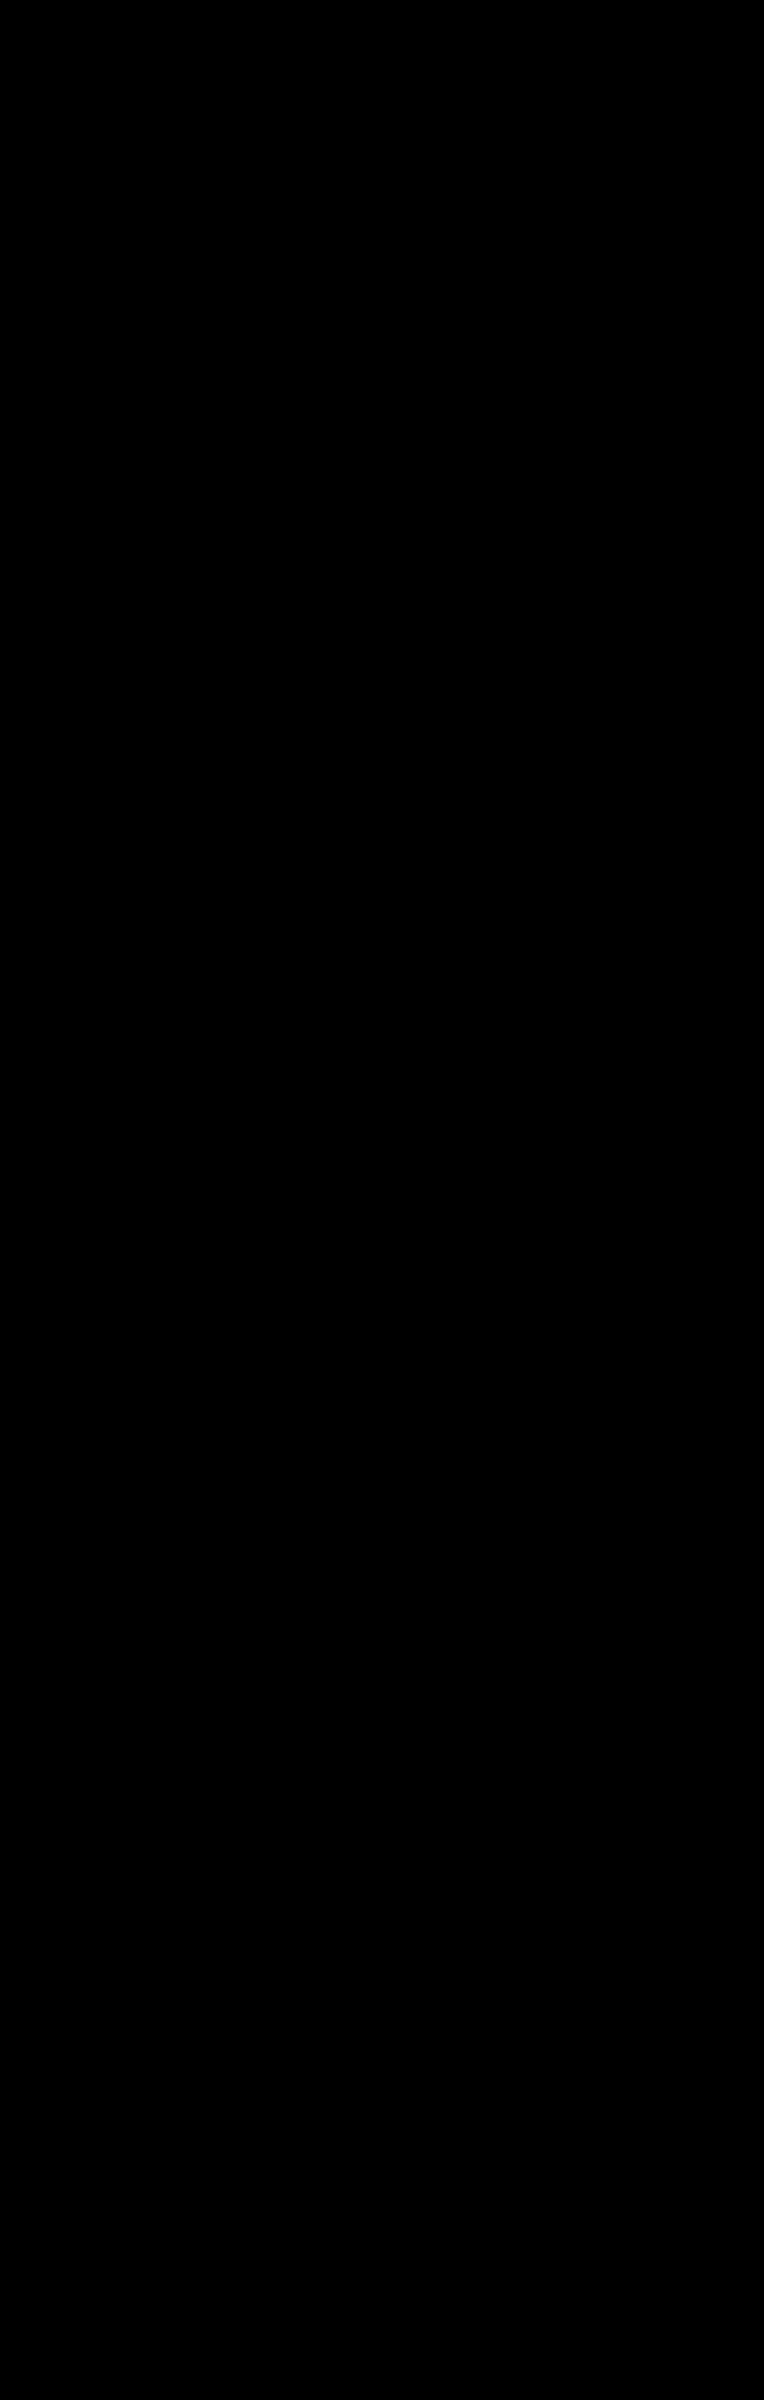 764x2400 Clipart